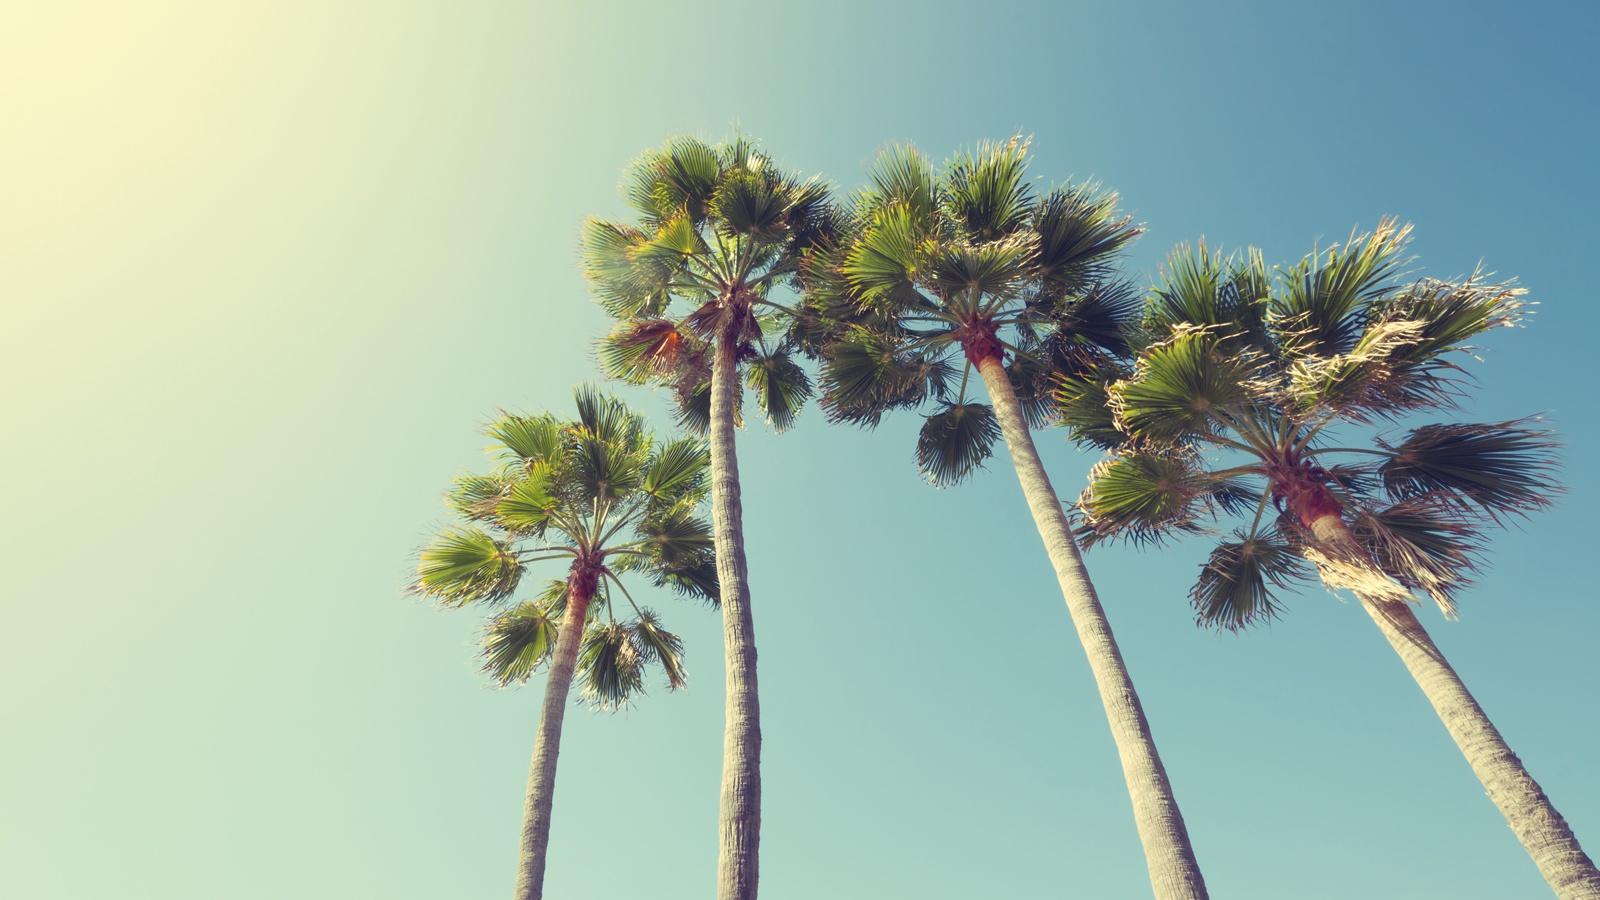 5-California-Cannabis-Retail-Shops-You-Should-Visit.jpg